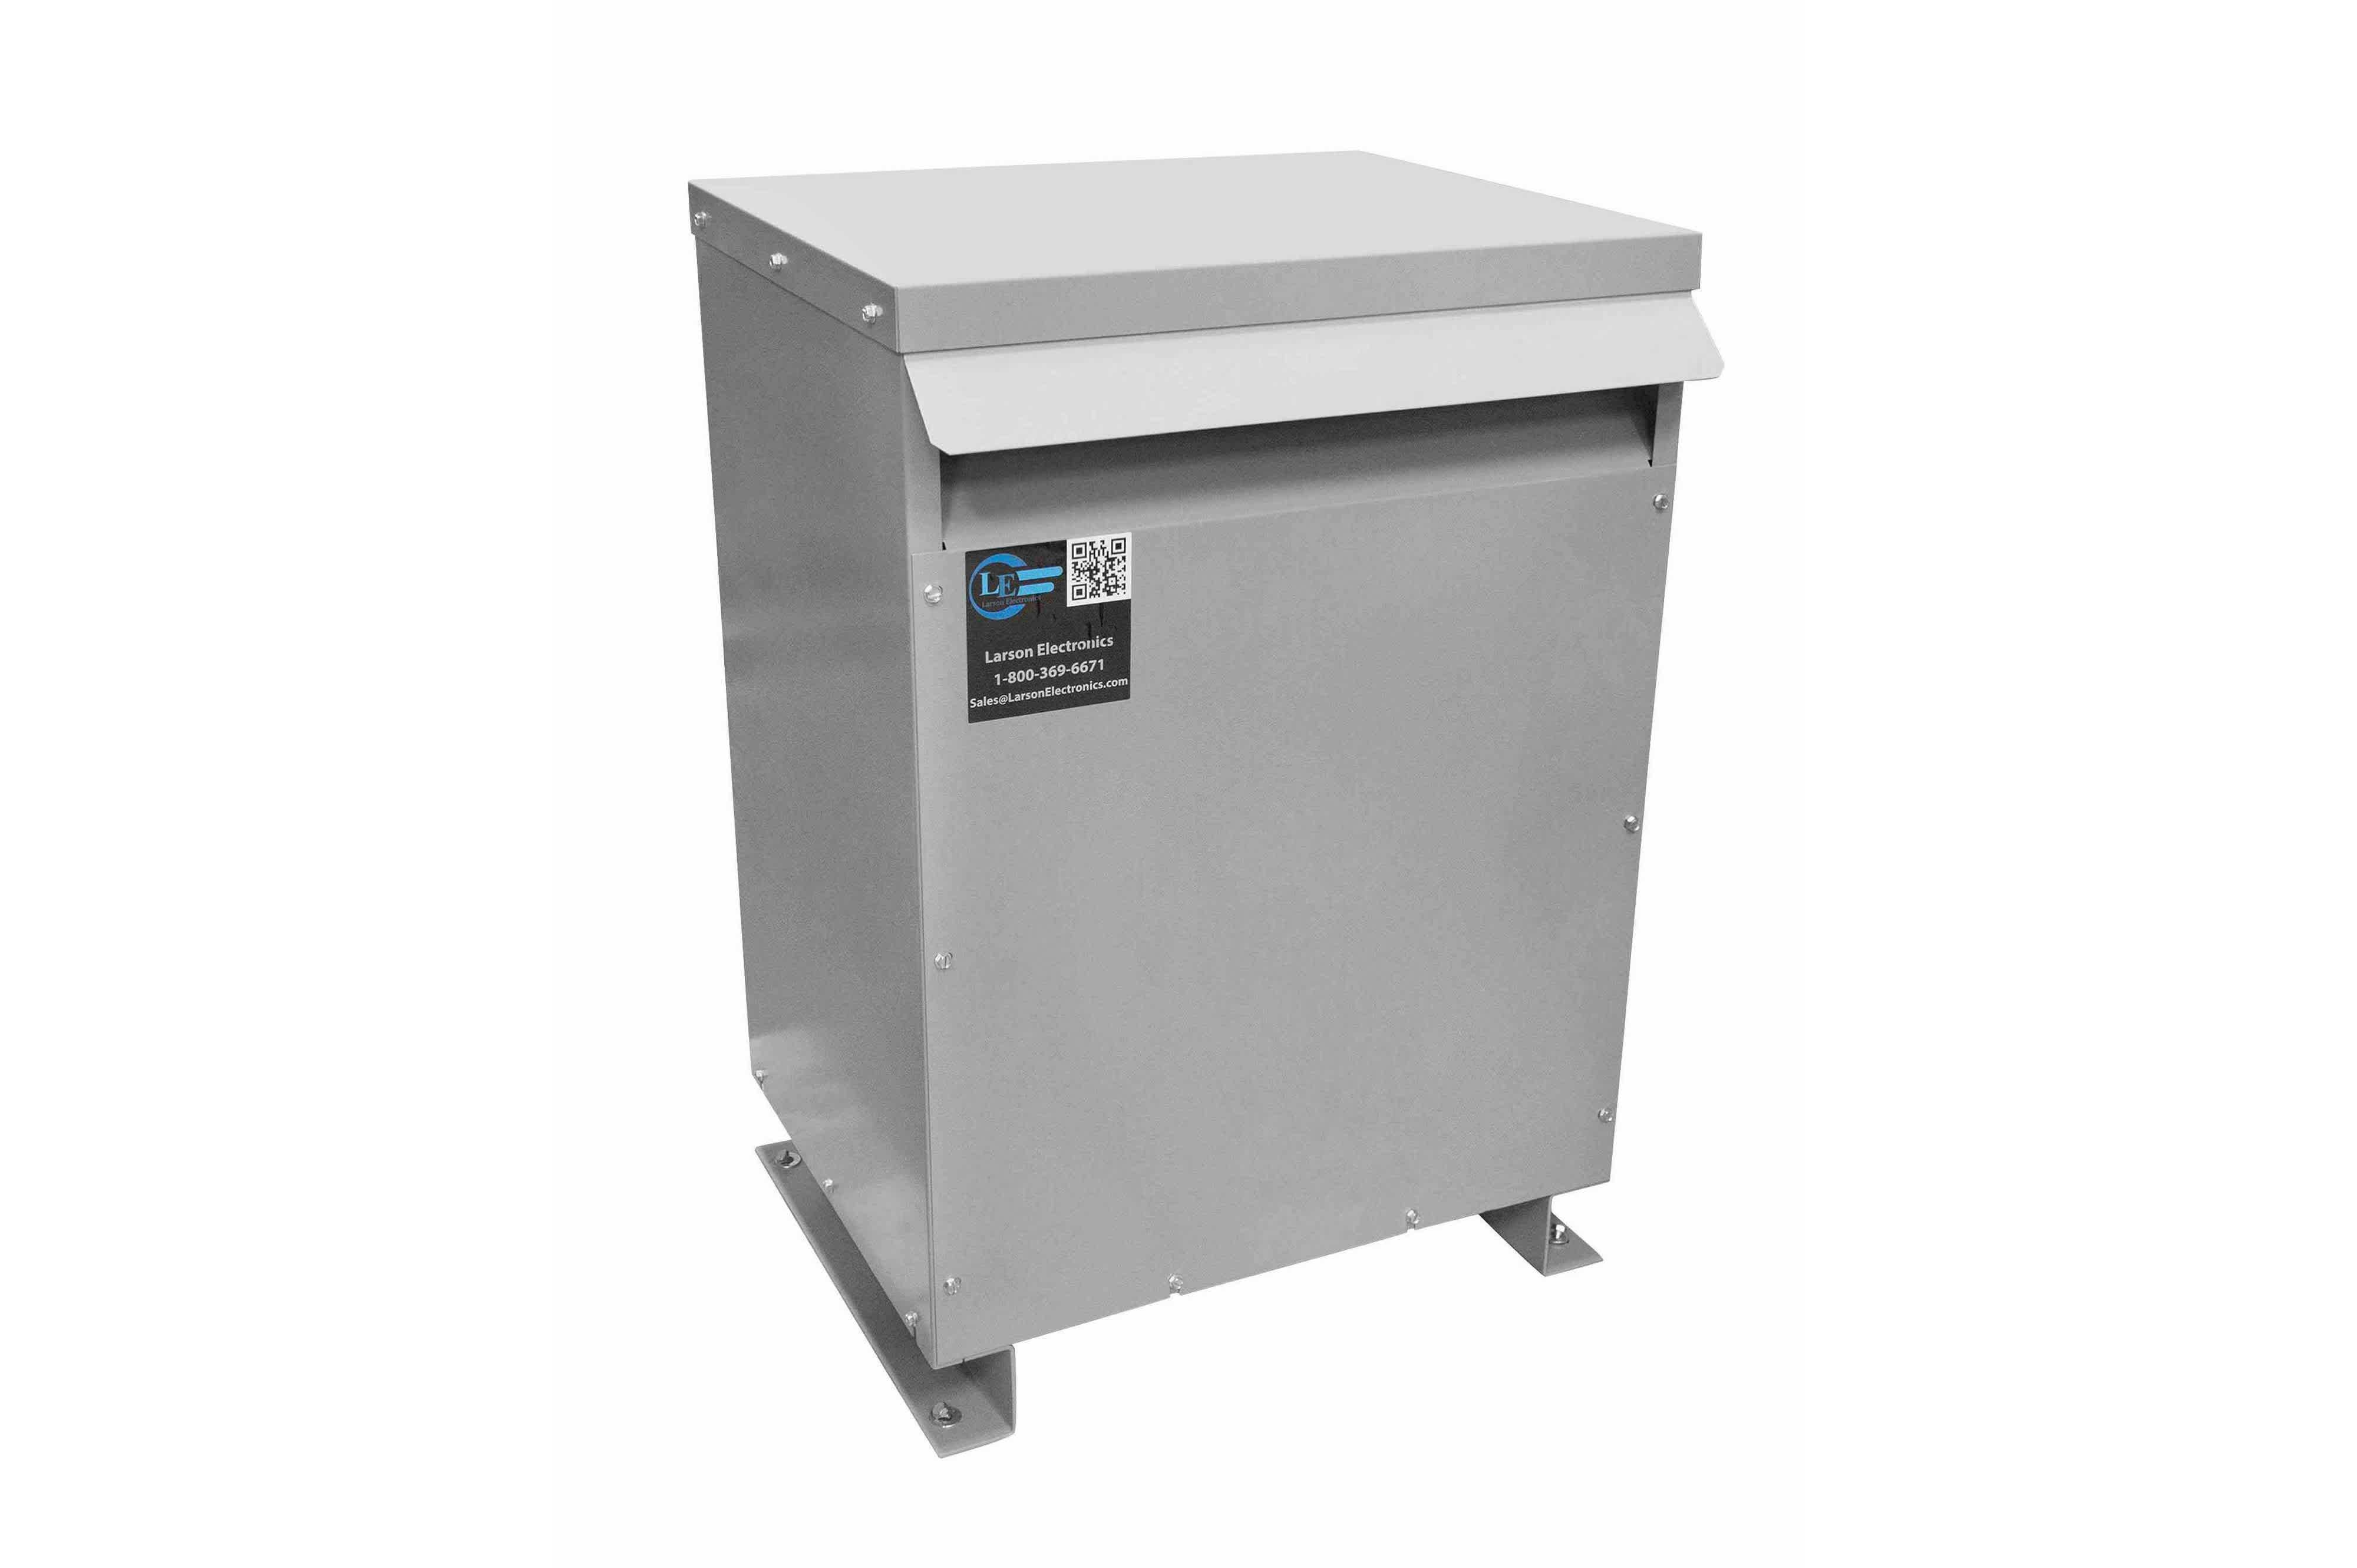 50 kVA 3PH Isolation Transformer, 600V Wye Primary, 415V Delta Secondary, N3R, Ventilated, 60 Hz